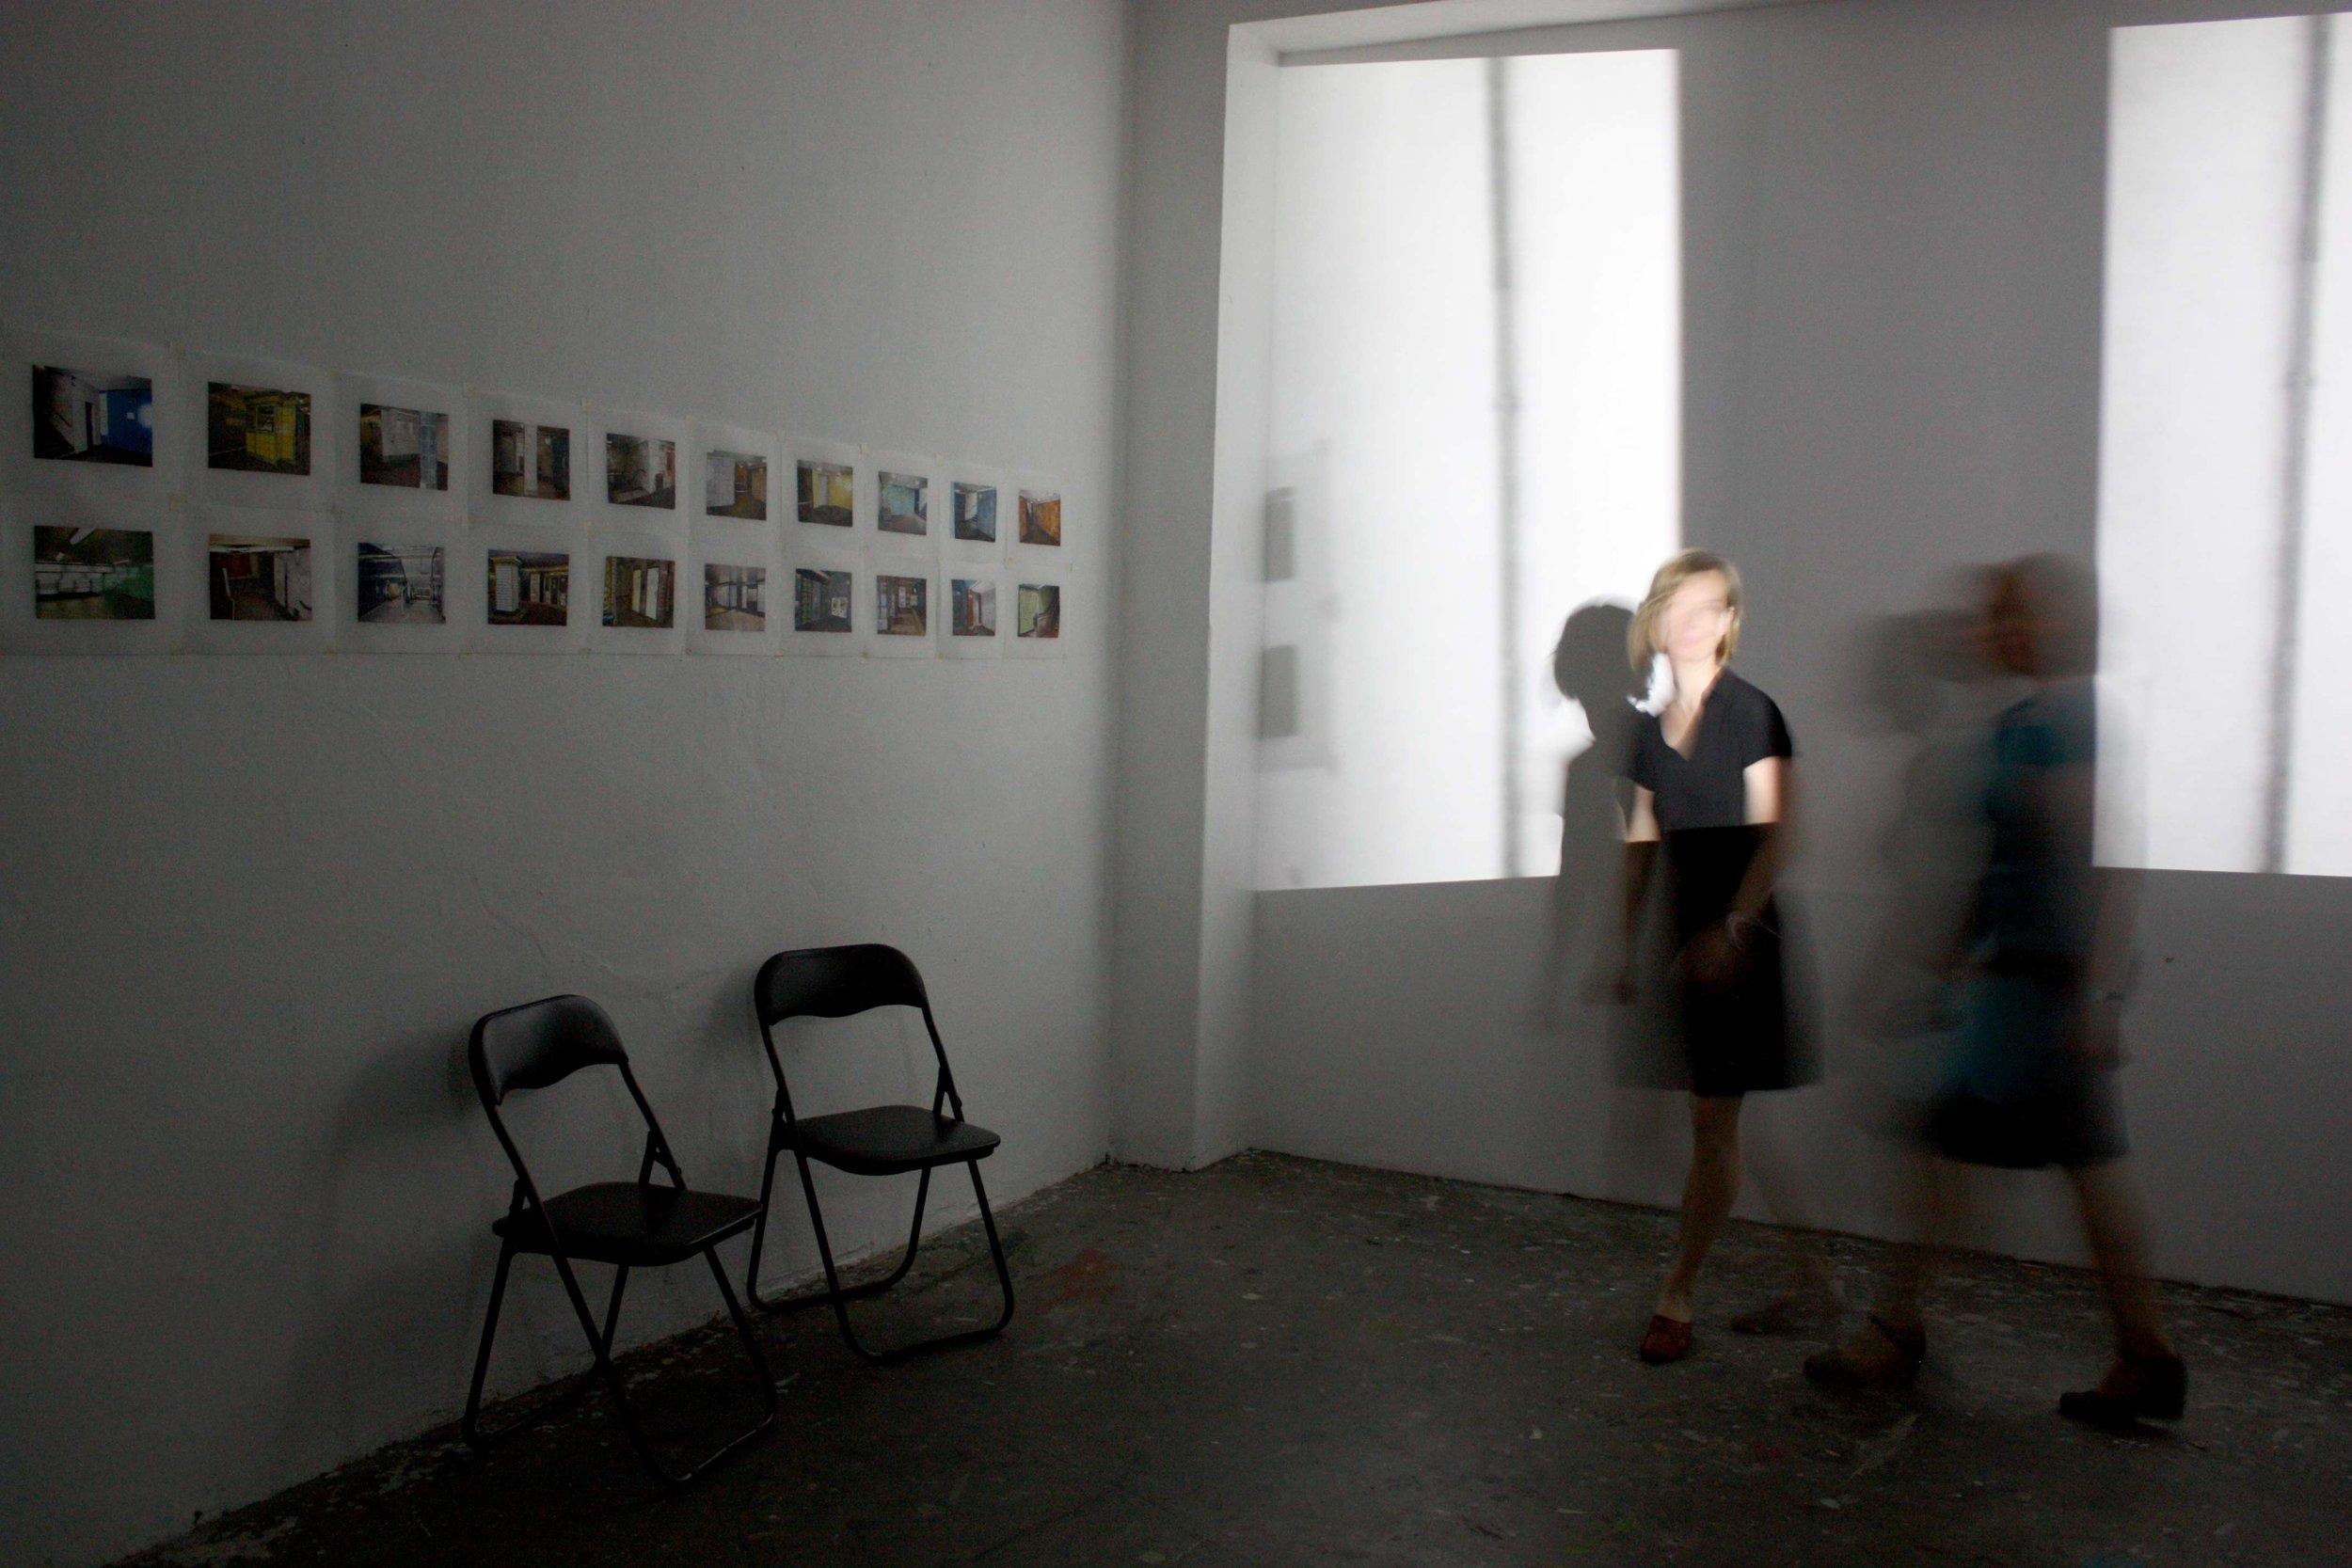 Floating Room (Berlin Studio), 2011,00:12:29 minute loop,color,no audio,installation view